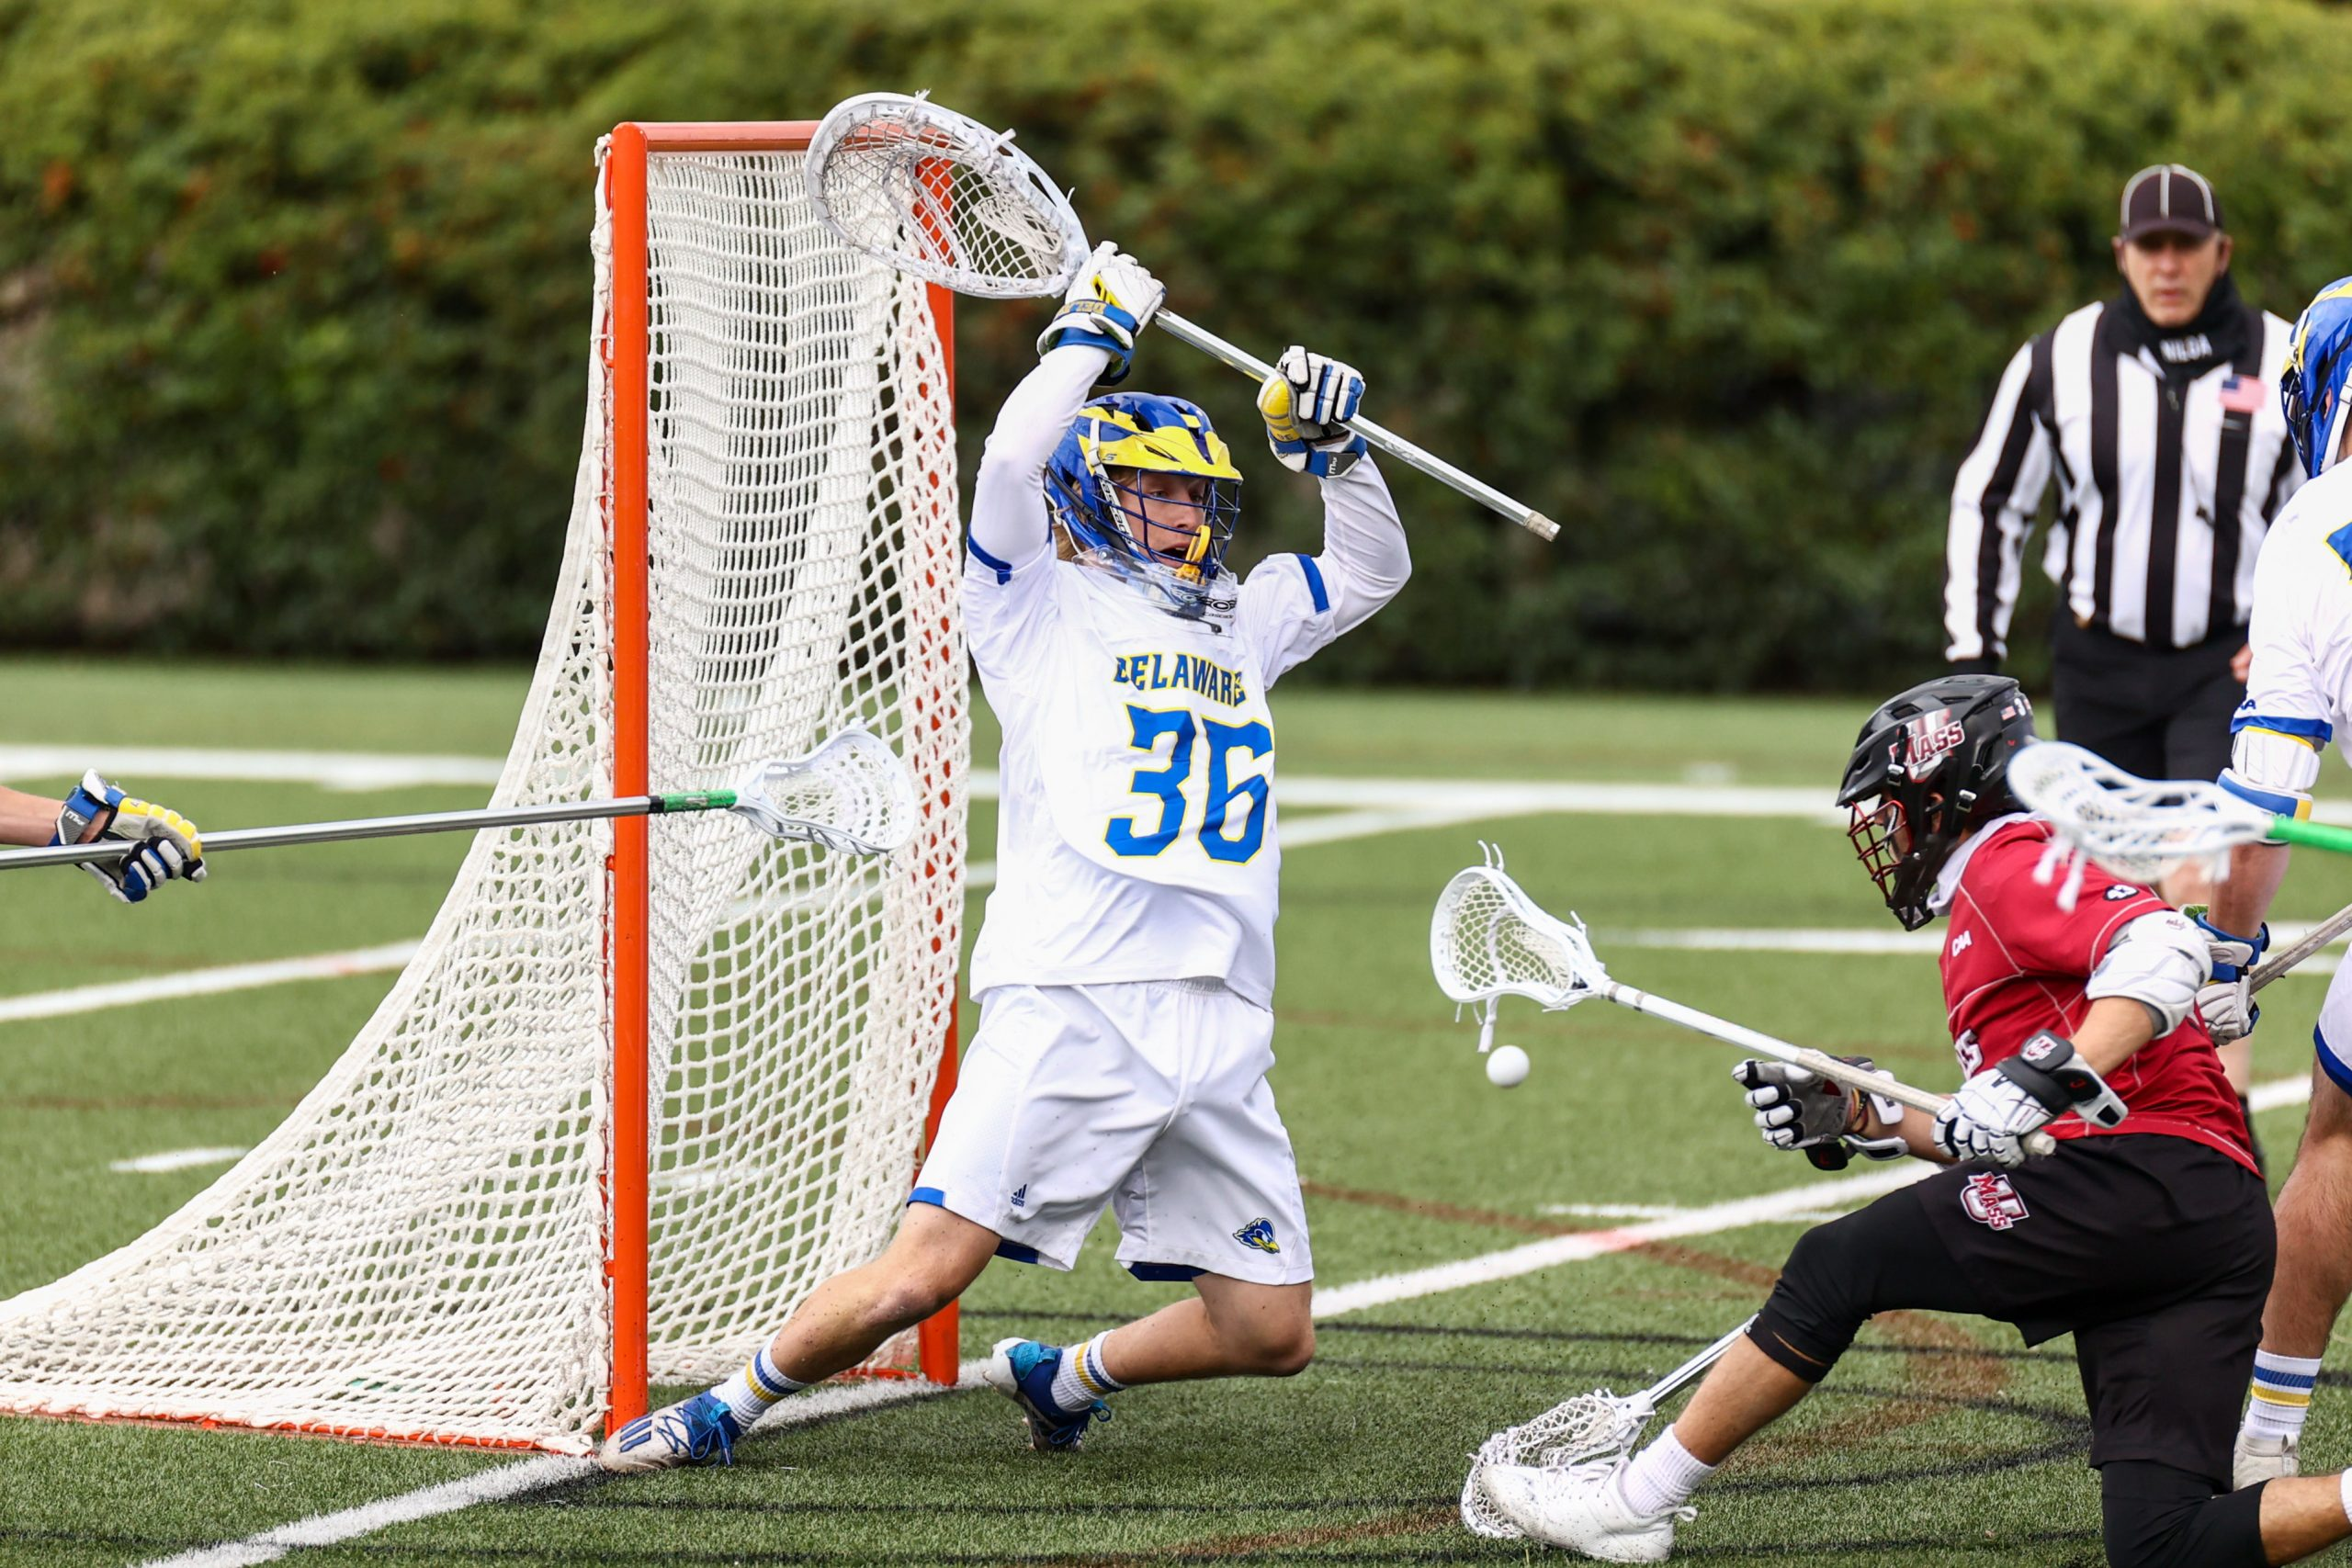 Westlake's Matt Kilkeary Delaware Lacrosse 2021